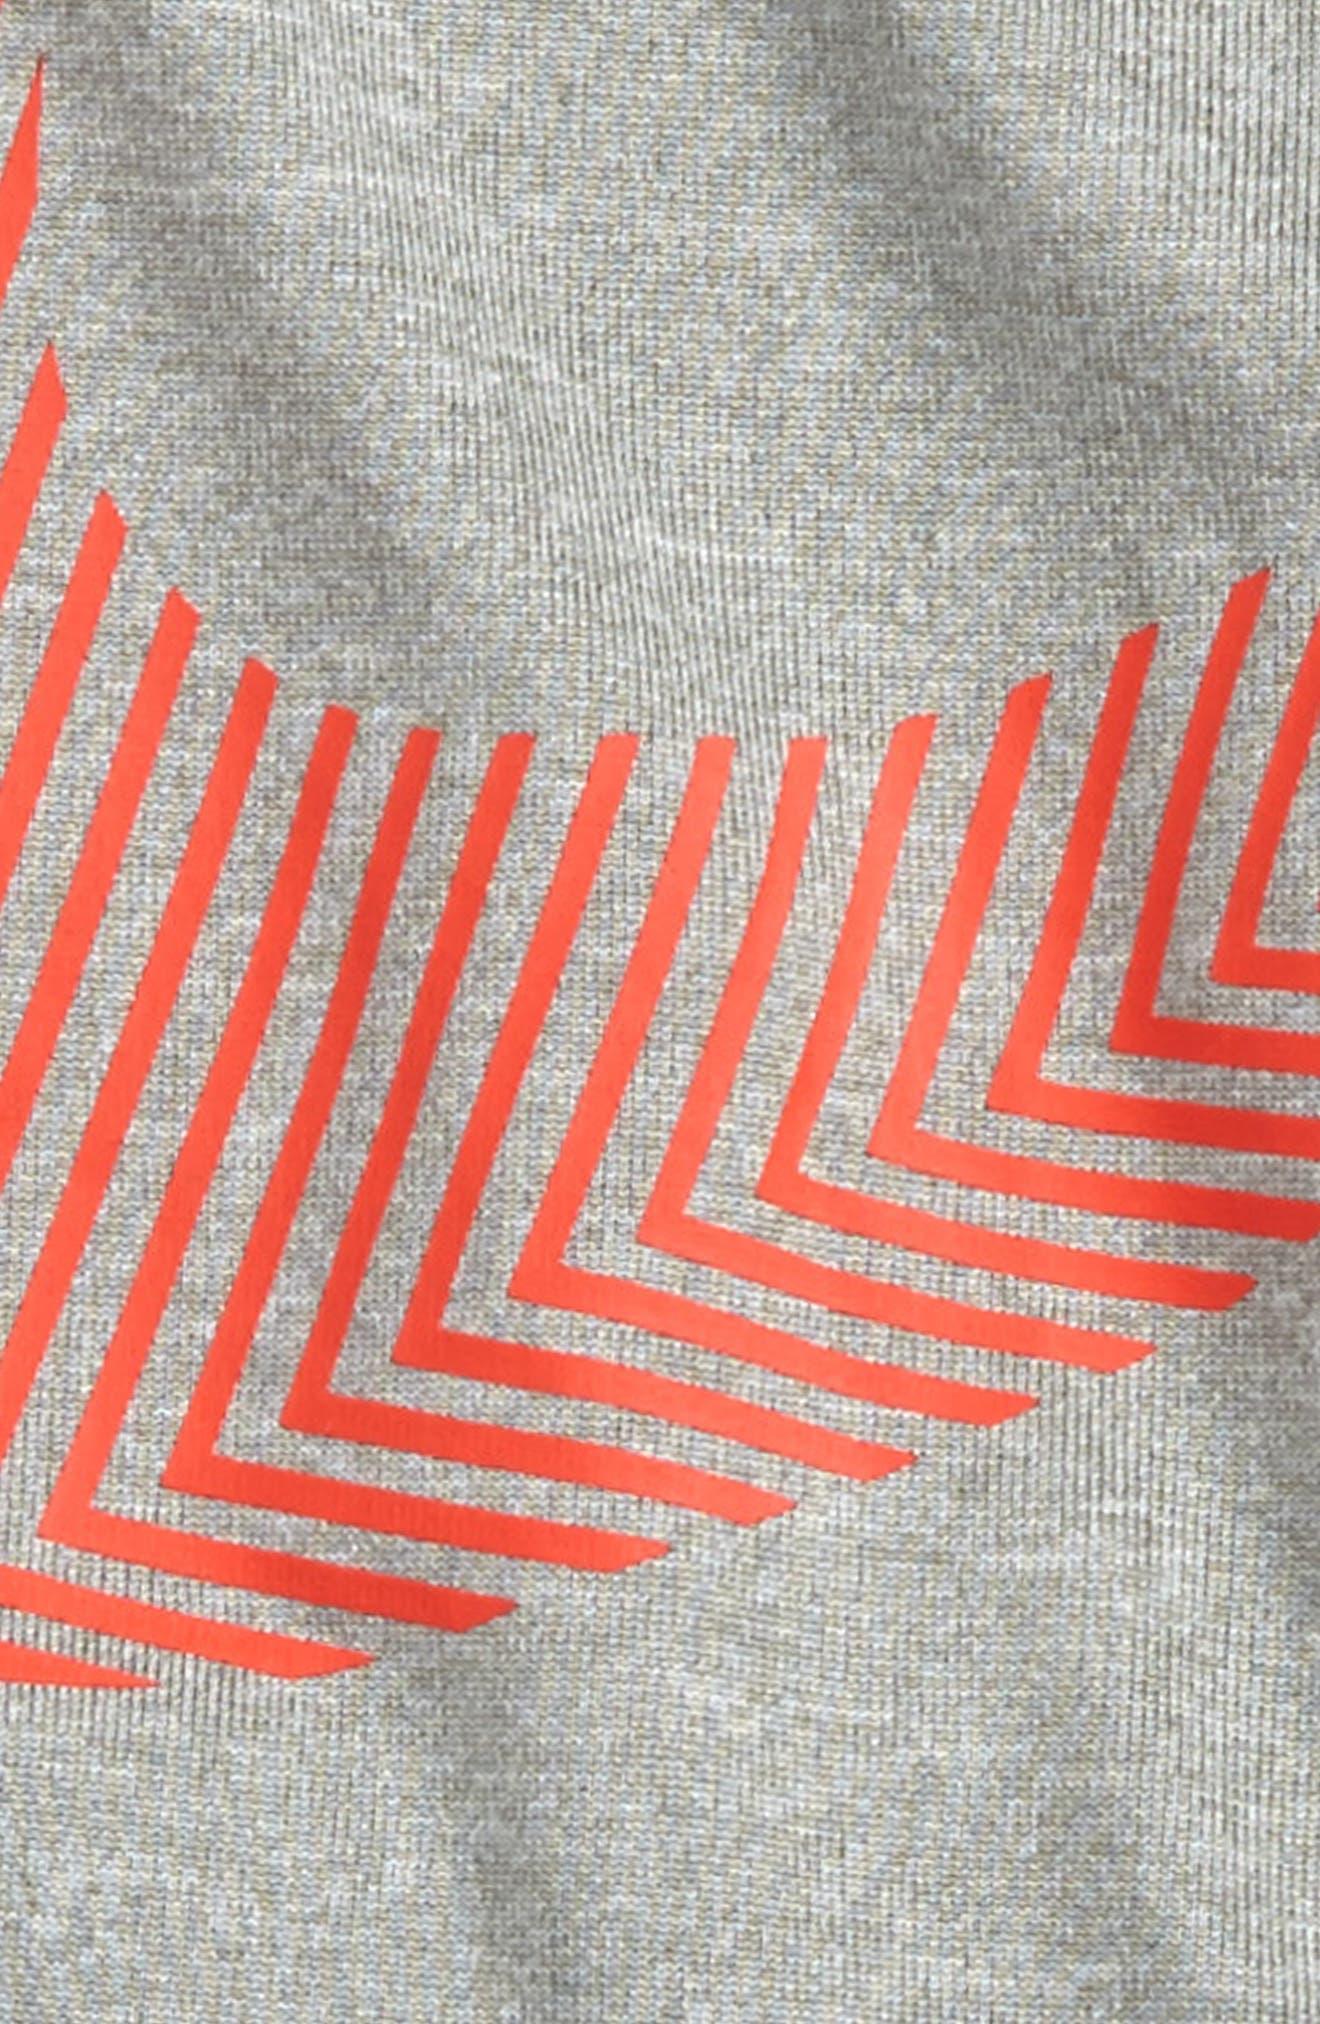 Wrap Around Swoosh Dry Shirt & Shorts Set,                             Alternate thumbnail 2, color,                             Dark Grey Heather